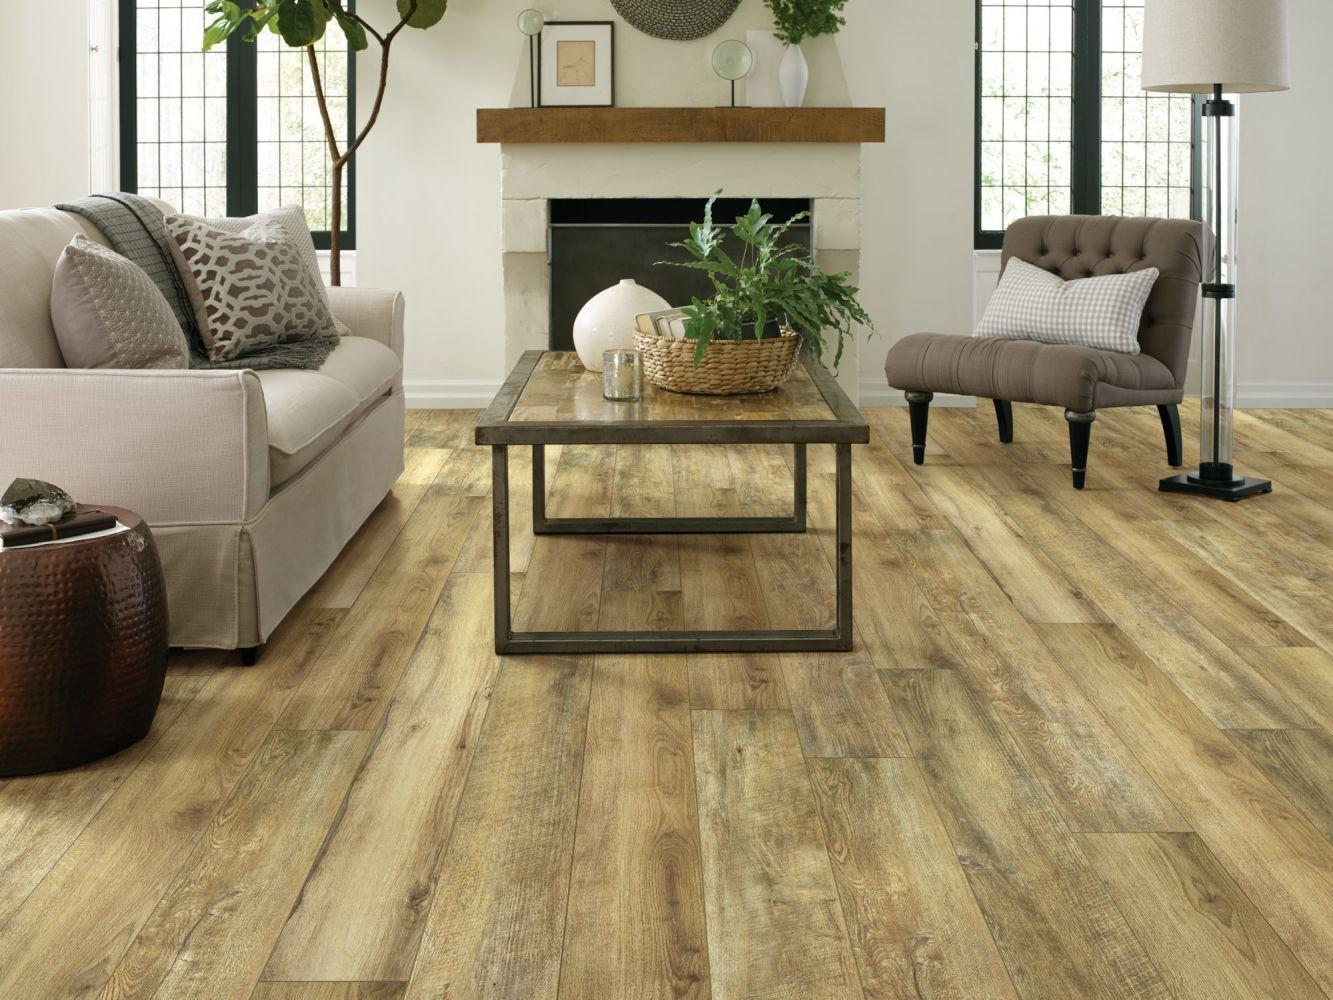 Shaw Floors Resilient Property Solutions Resolute XL HD Plus Hazelnut Oak 07053_VE387